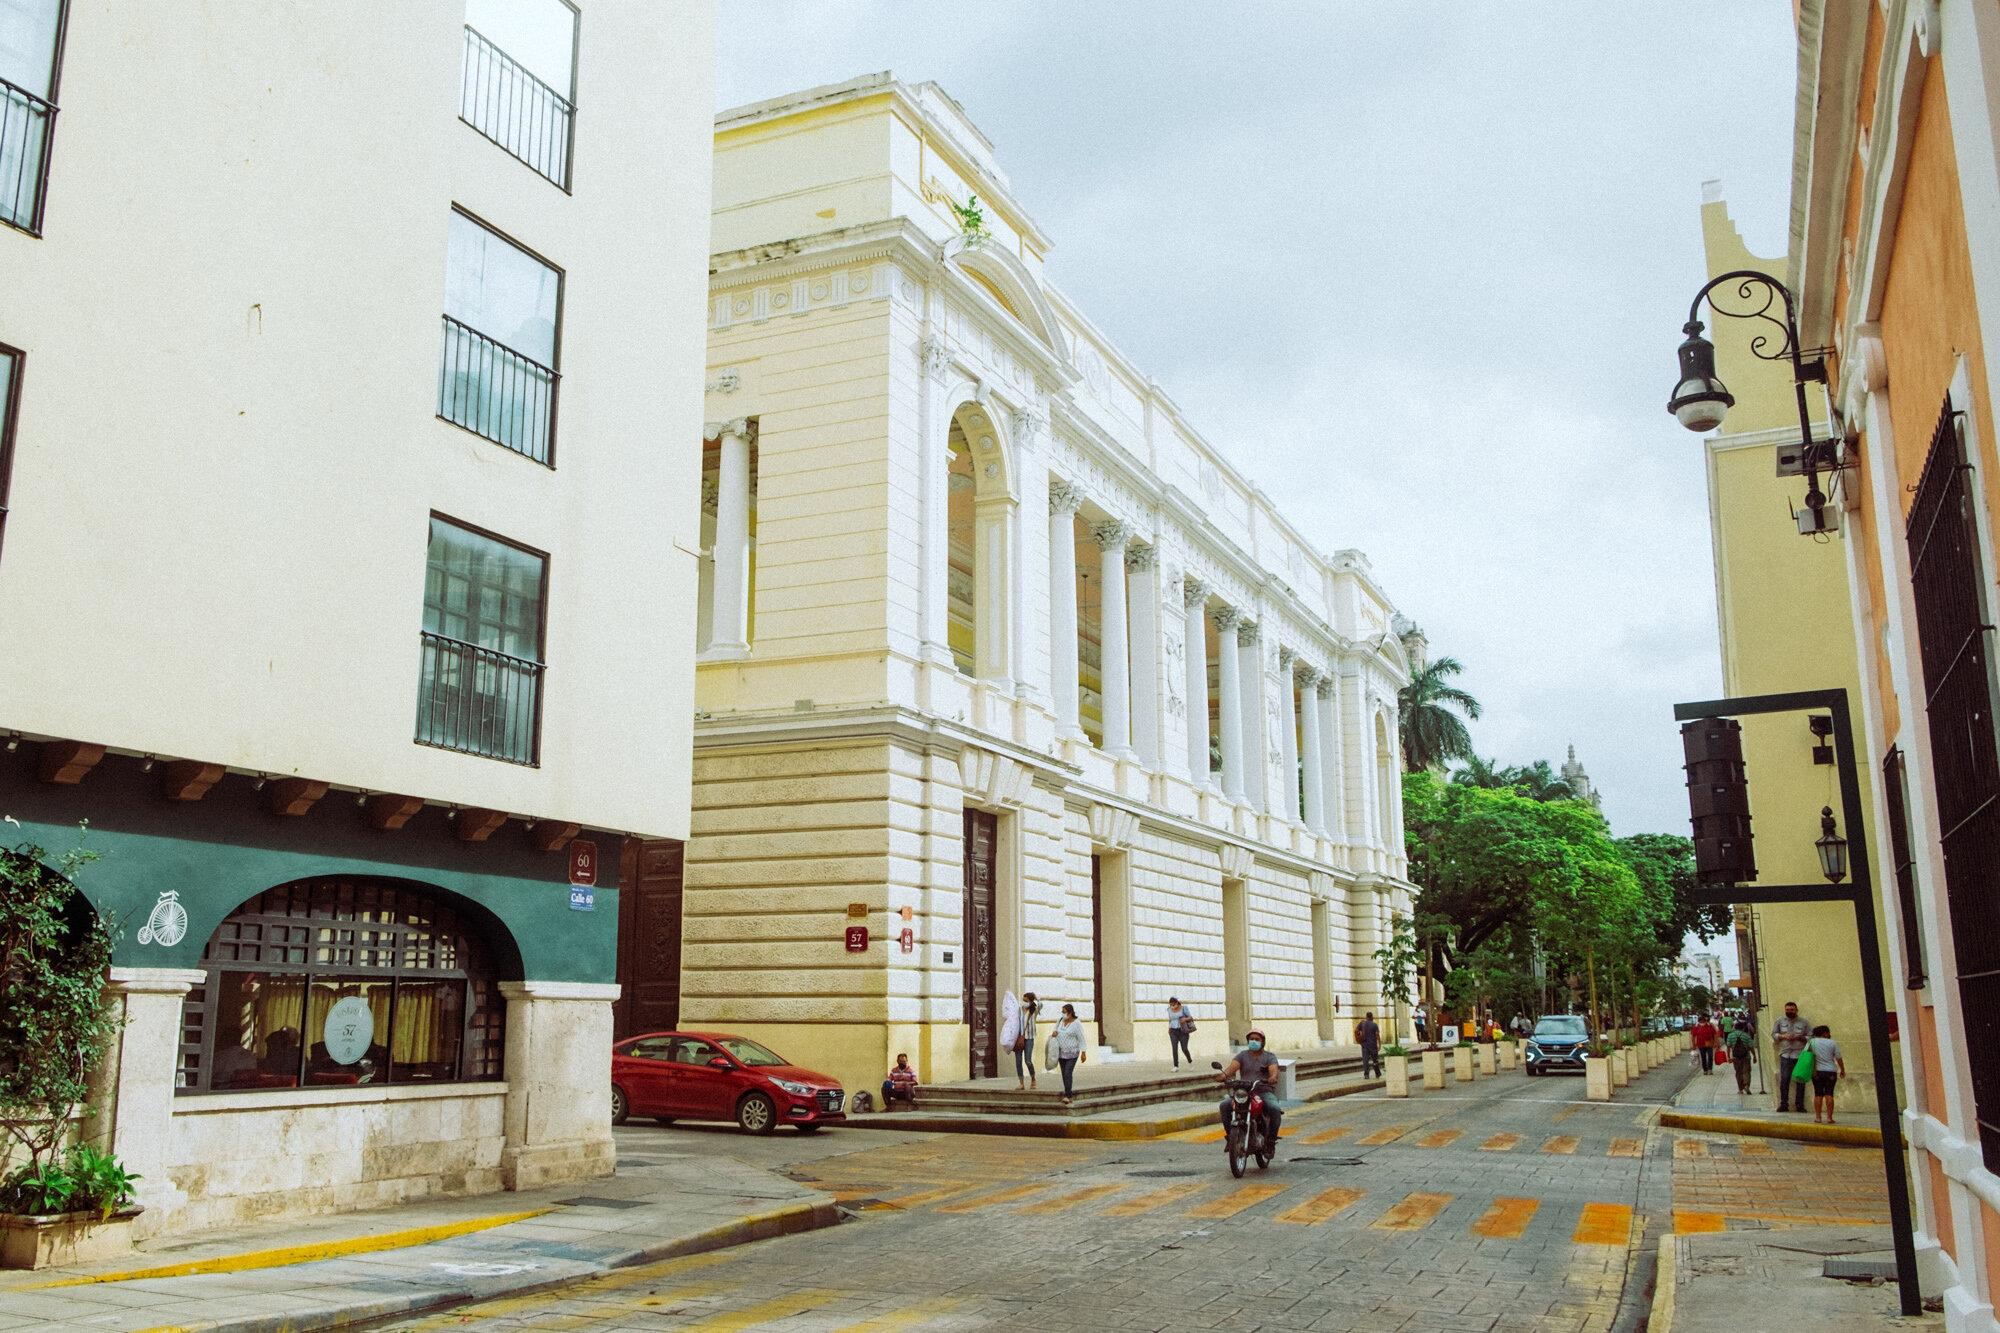 Rachel Off Duty: The Streets of Merida, Mexico